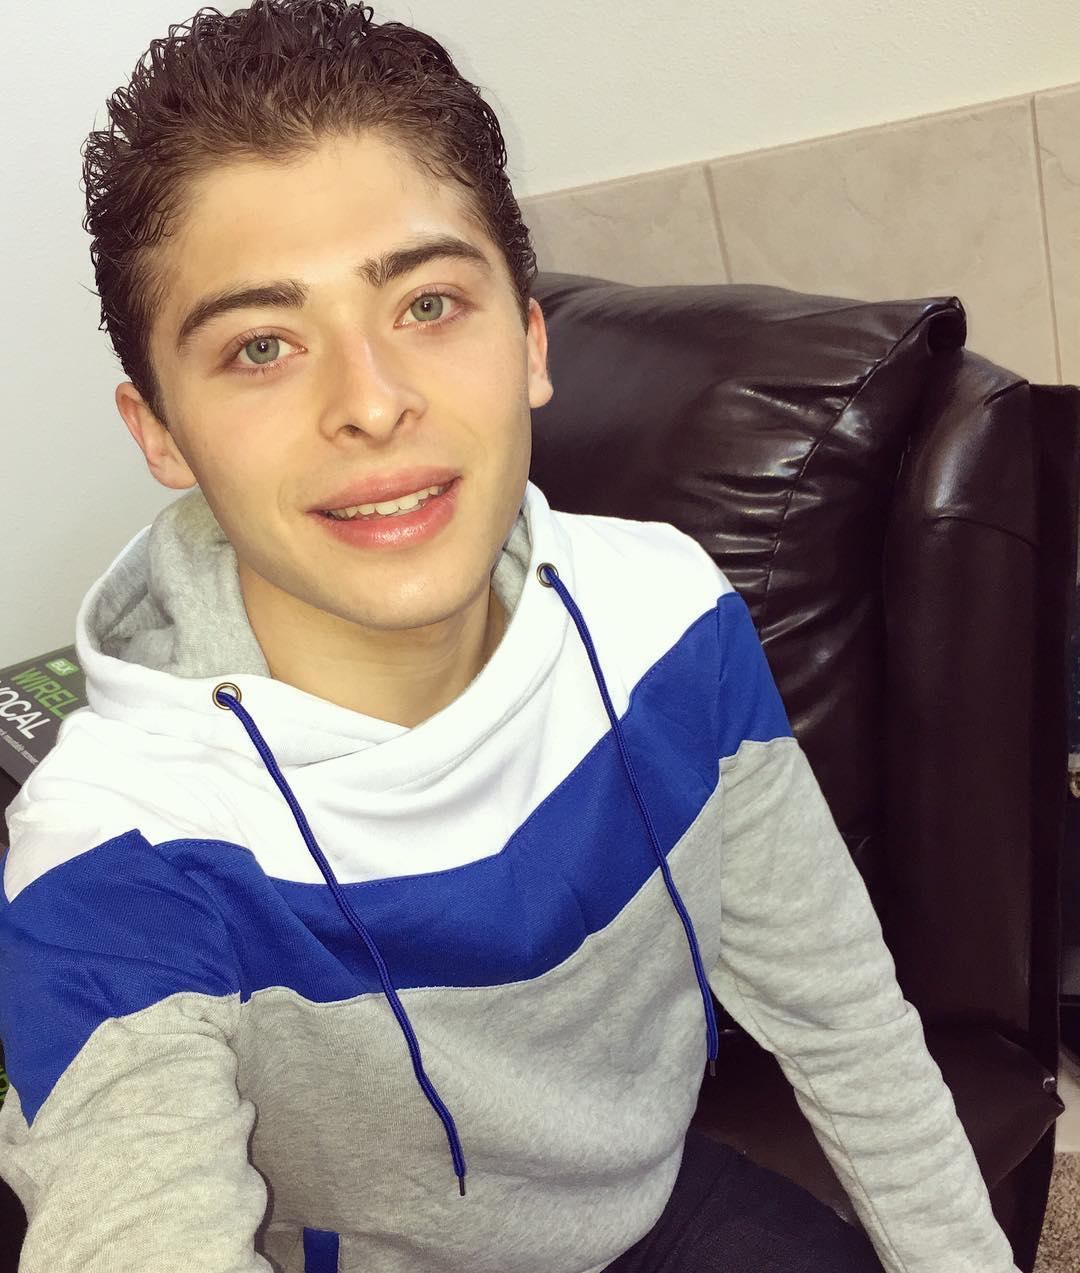 Picture of Ryan Ochoa in General Pictures - ryan-ochoa ...